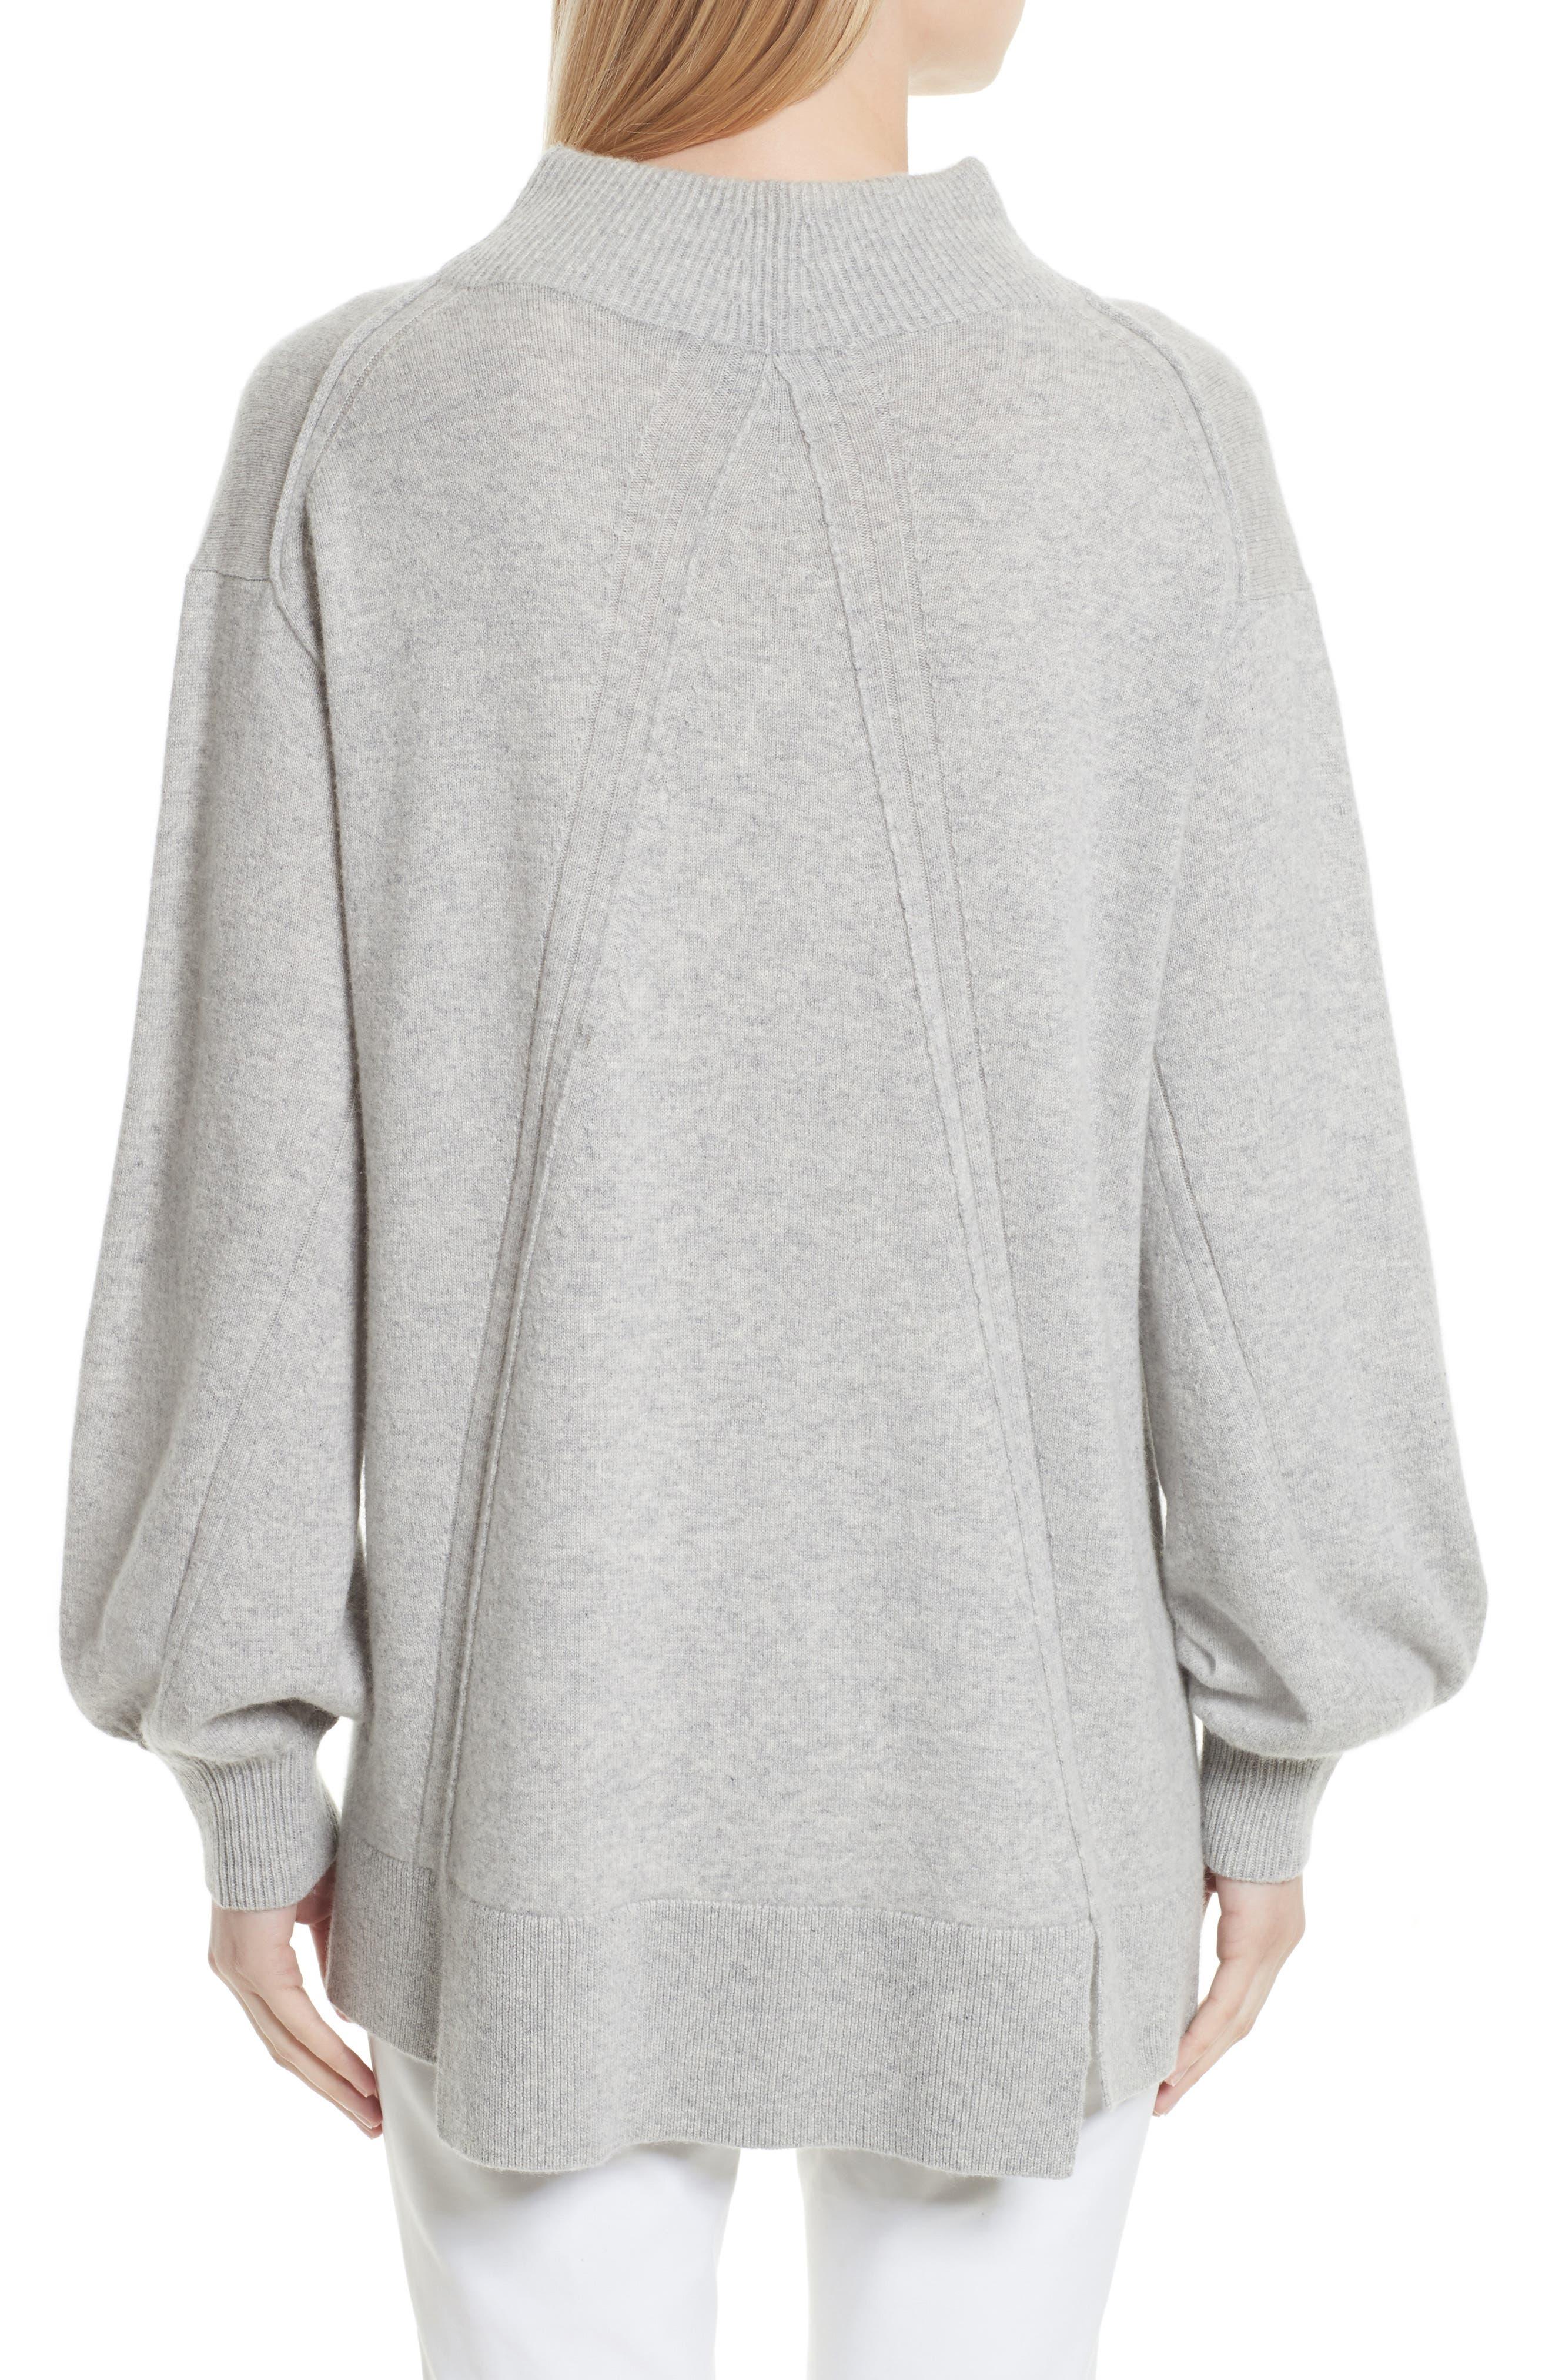 Ace Cashmere Turtleneck Sweater,                             Alternate thumbnail 2, color,                             058